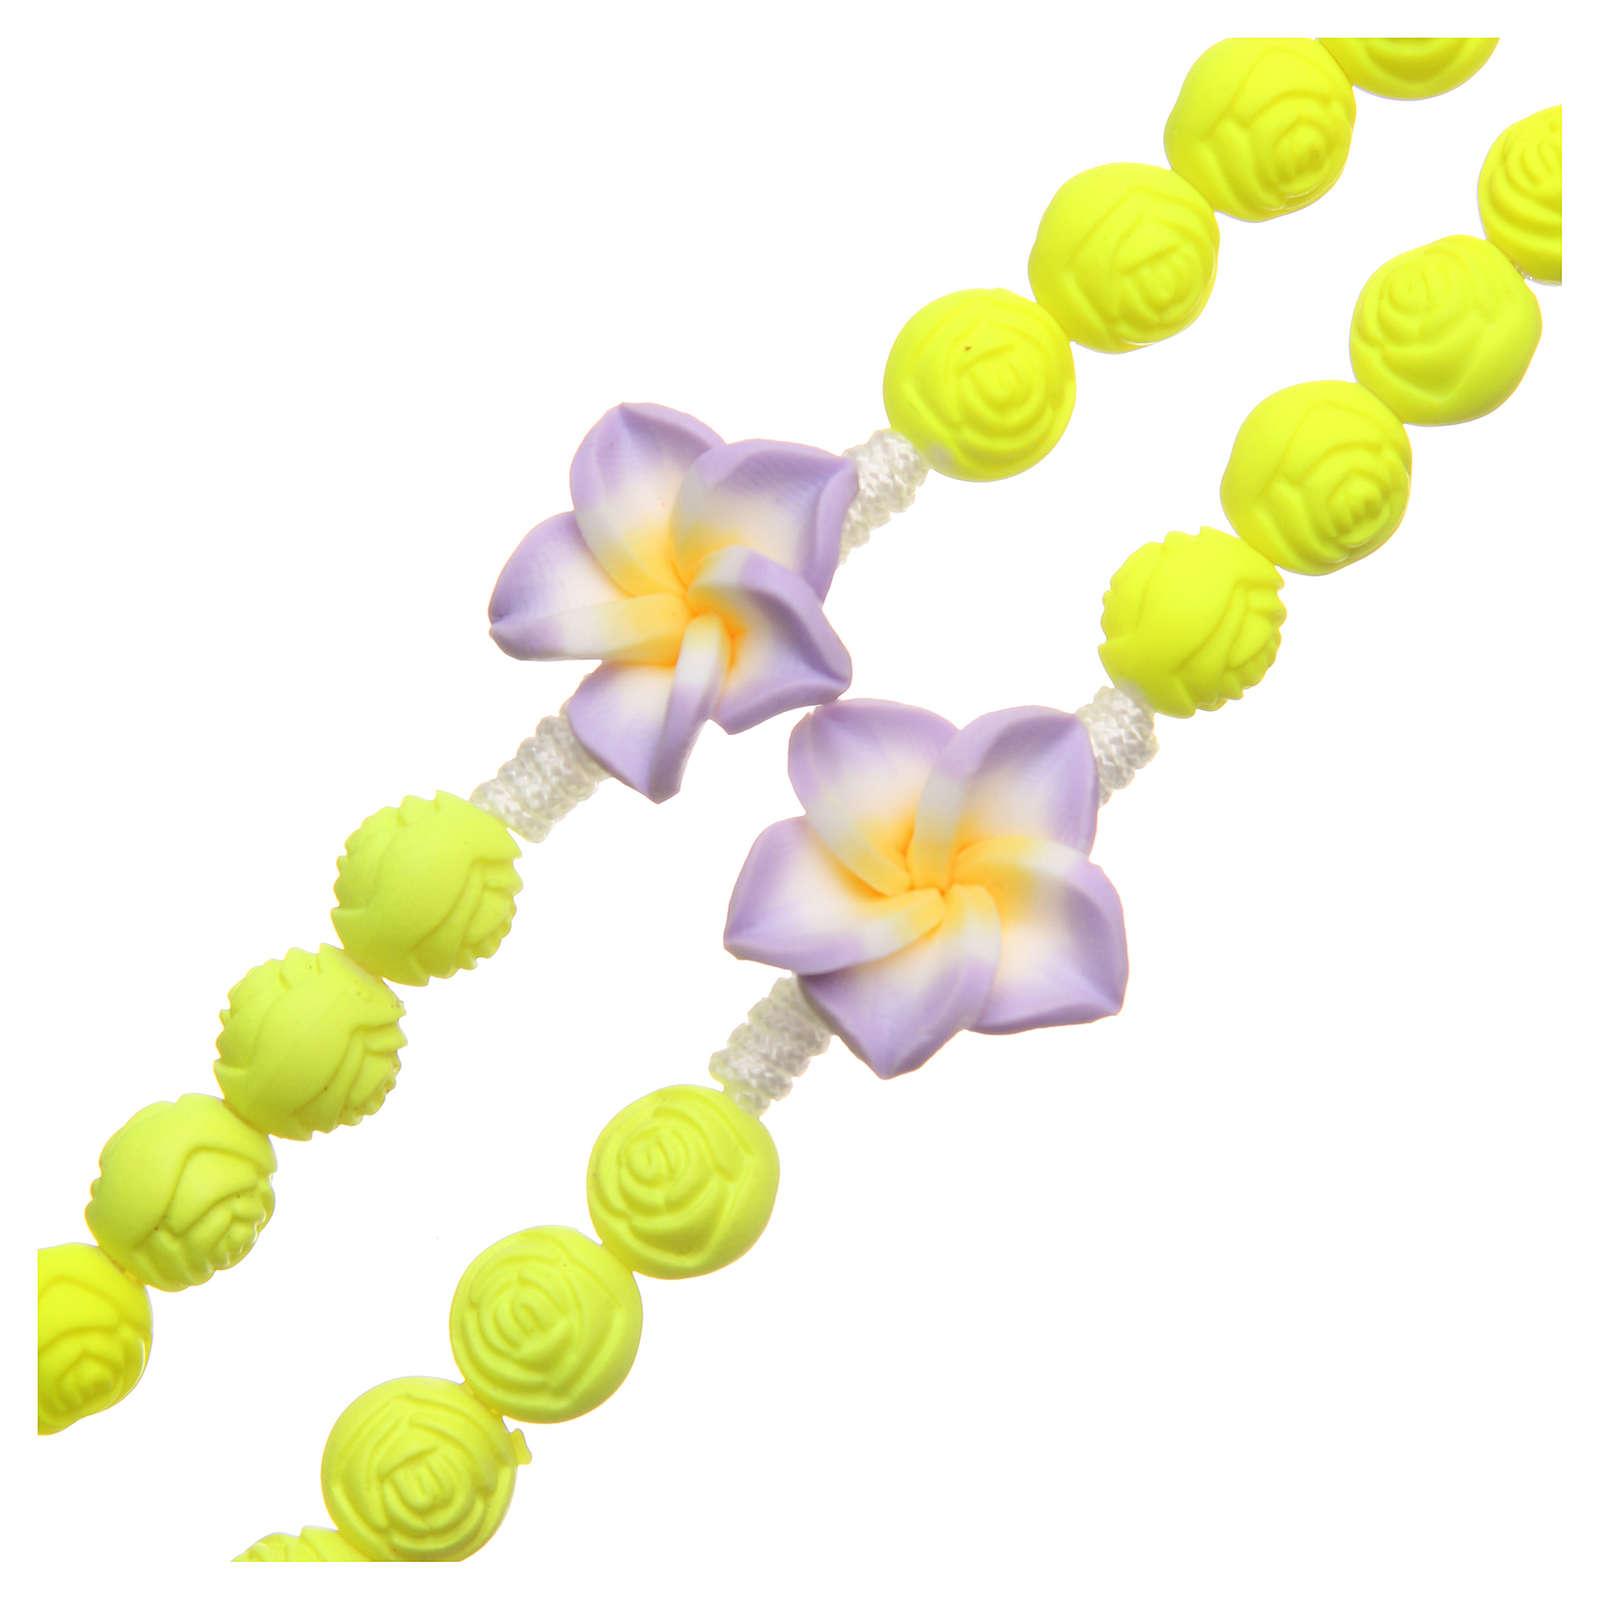 Chapelet Medjugorje petites roses jaune fluo 4